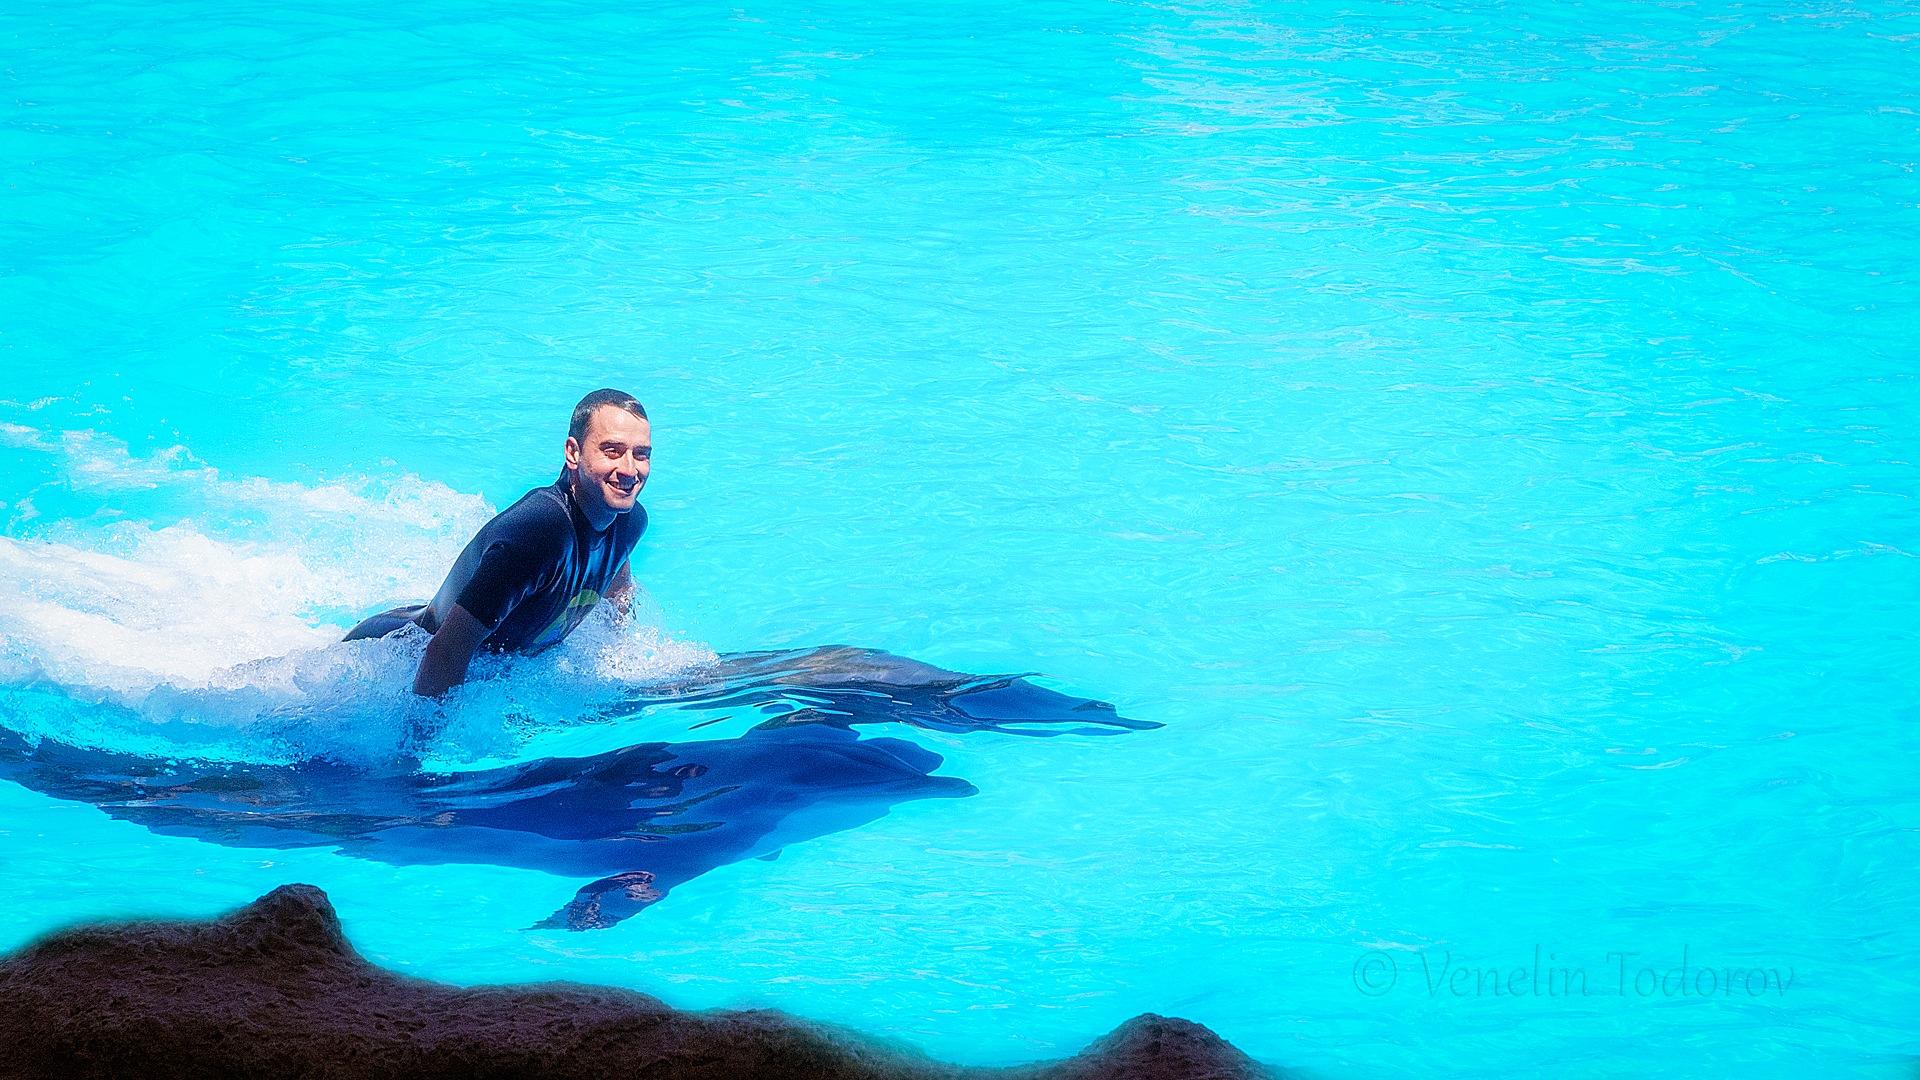 Riding dolphins by Venelin Todorov